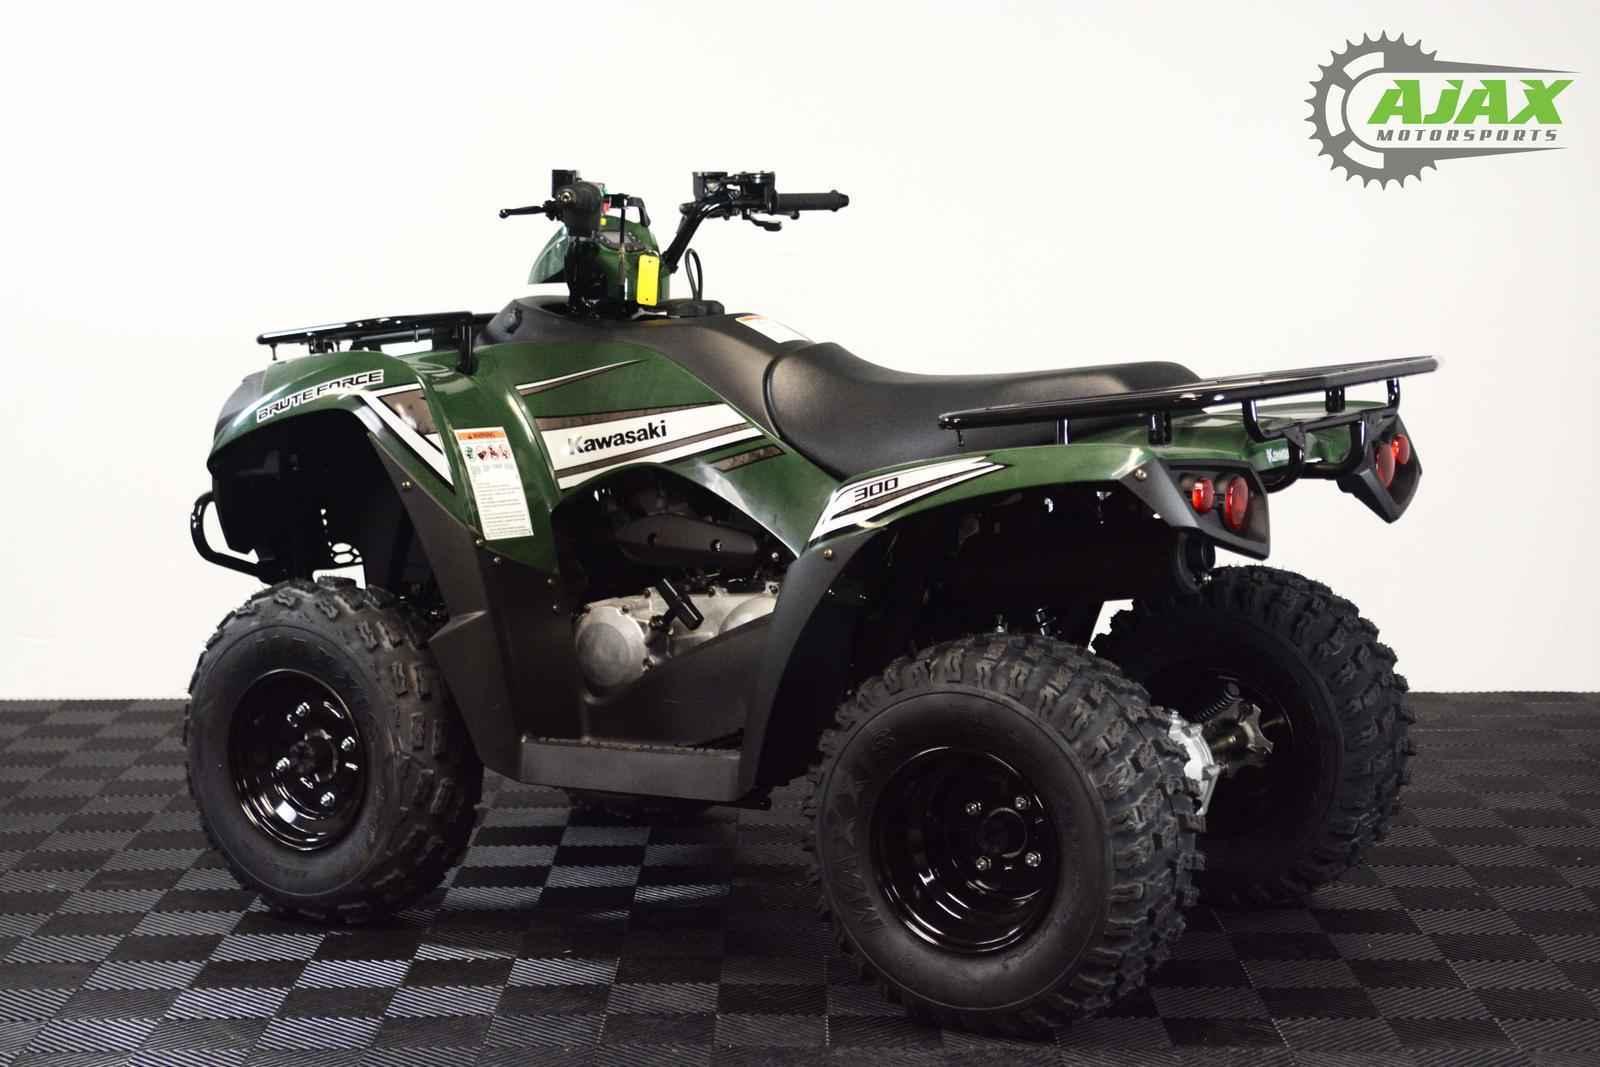 New 2017 Kawasaki BRUTE FORCE 300 ATVs For Sale in Oklahoma on ATV